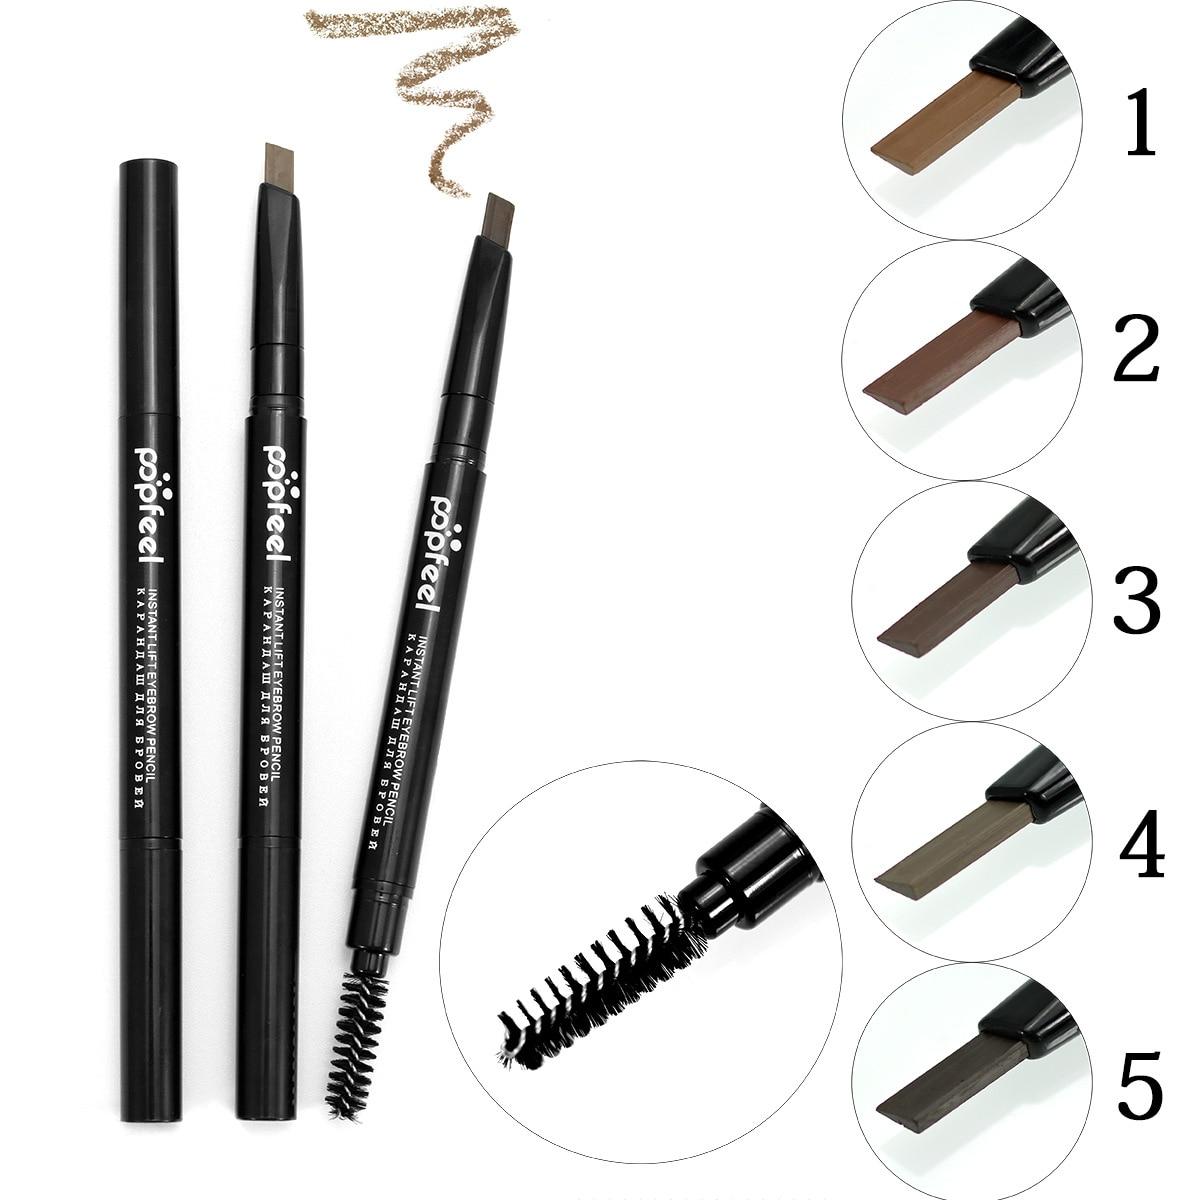 New eyeliner makeup for women eye liner cosmetic